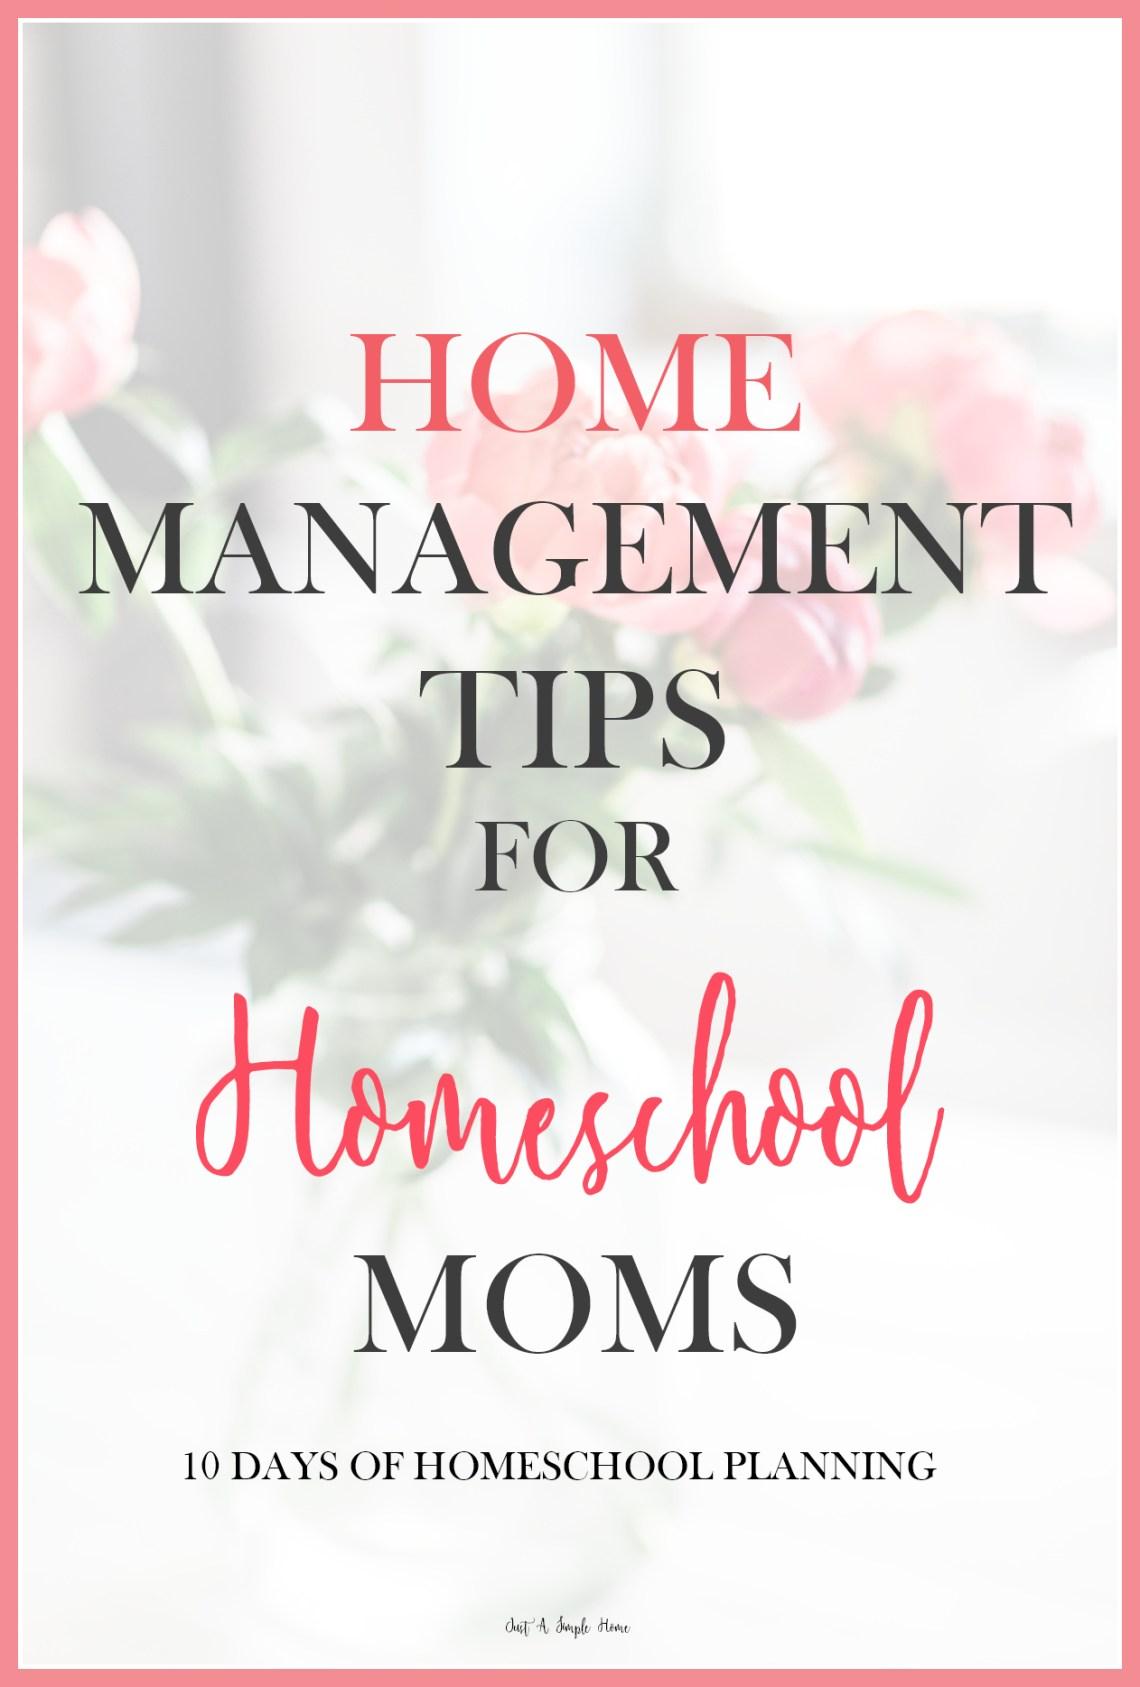 Home Management Tips for Homeschool Moms - 10 Days of Homeschool Planning